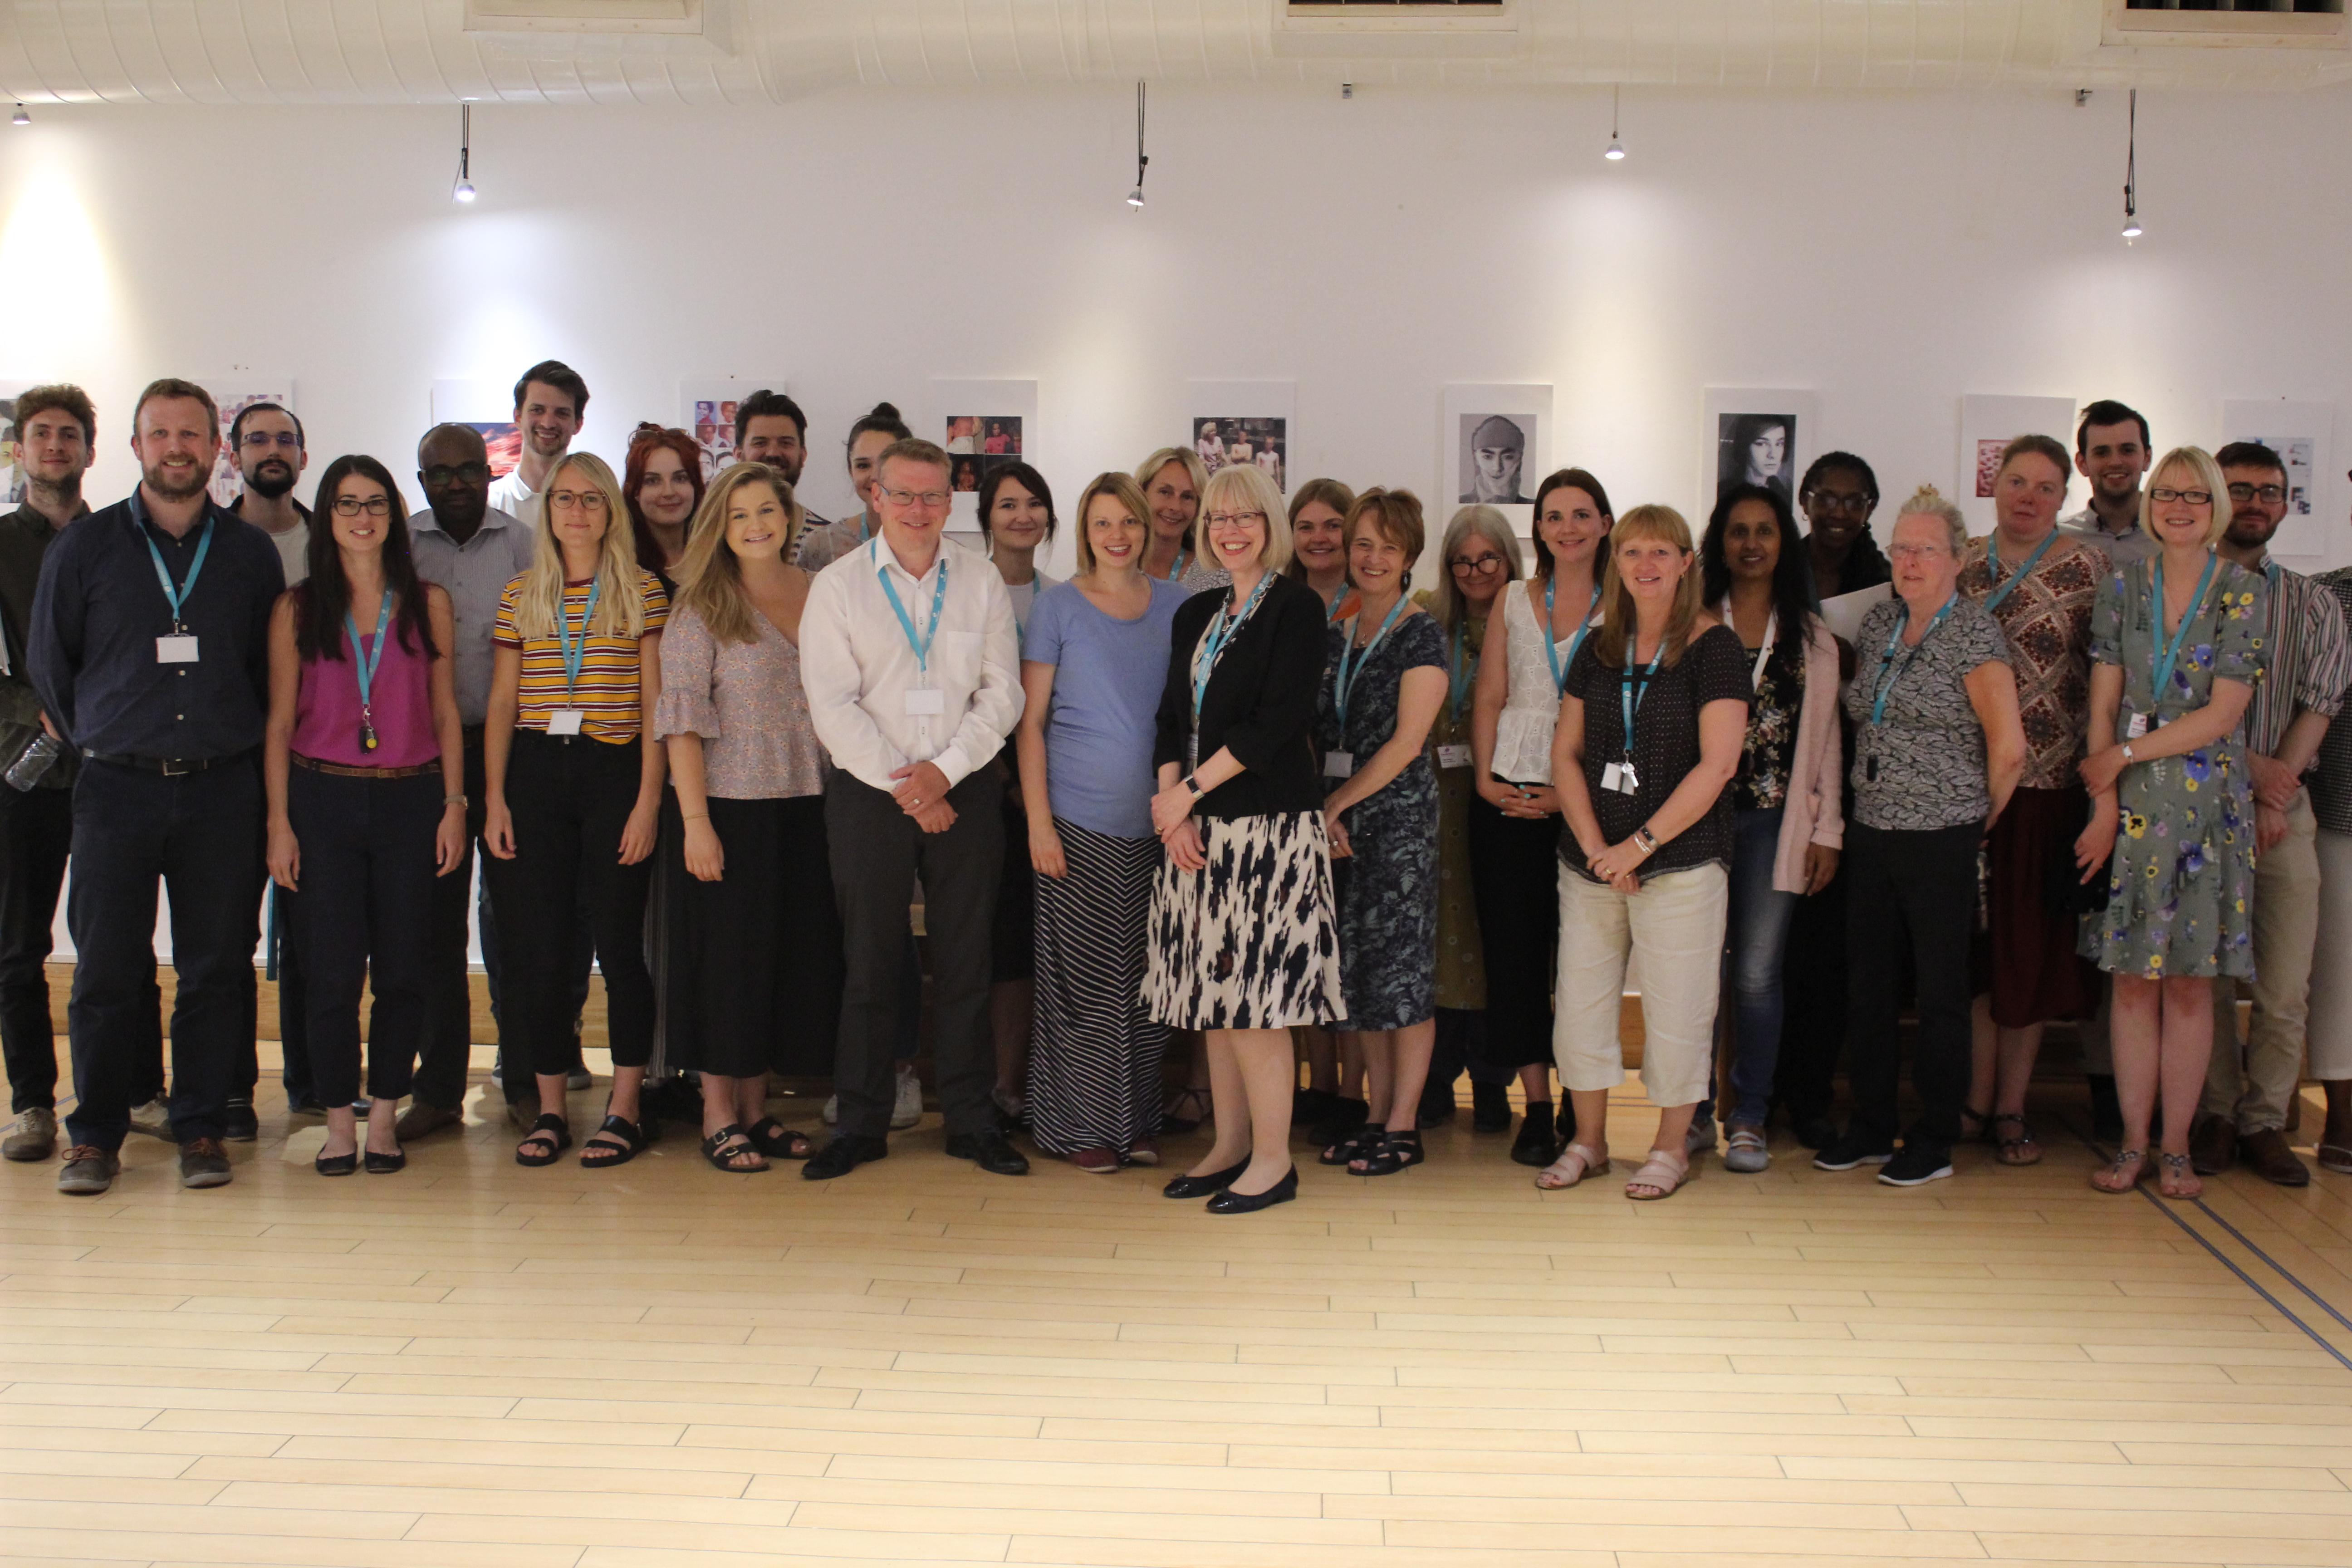 A photo of all Dementia UK staff